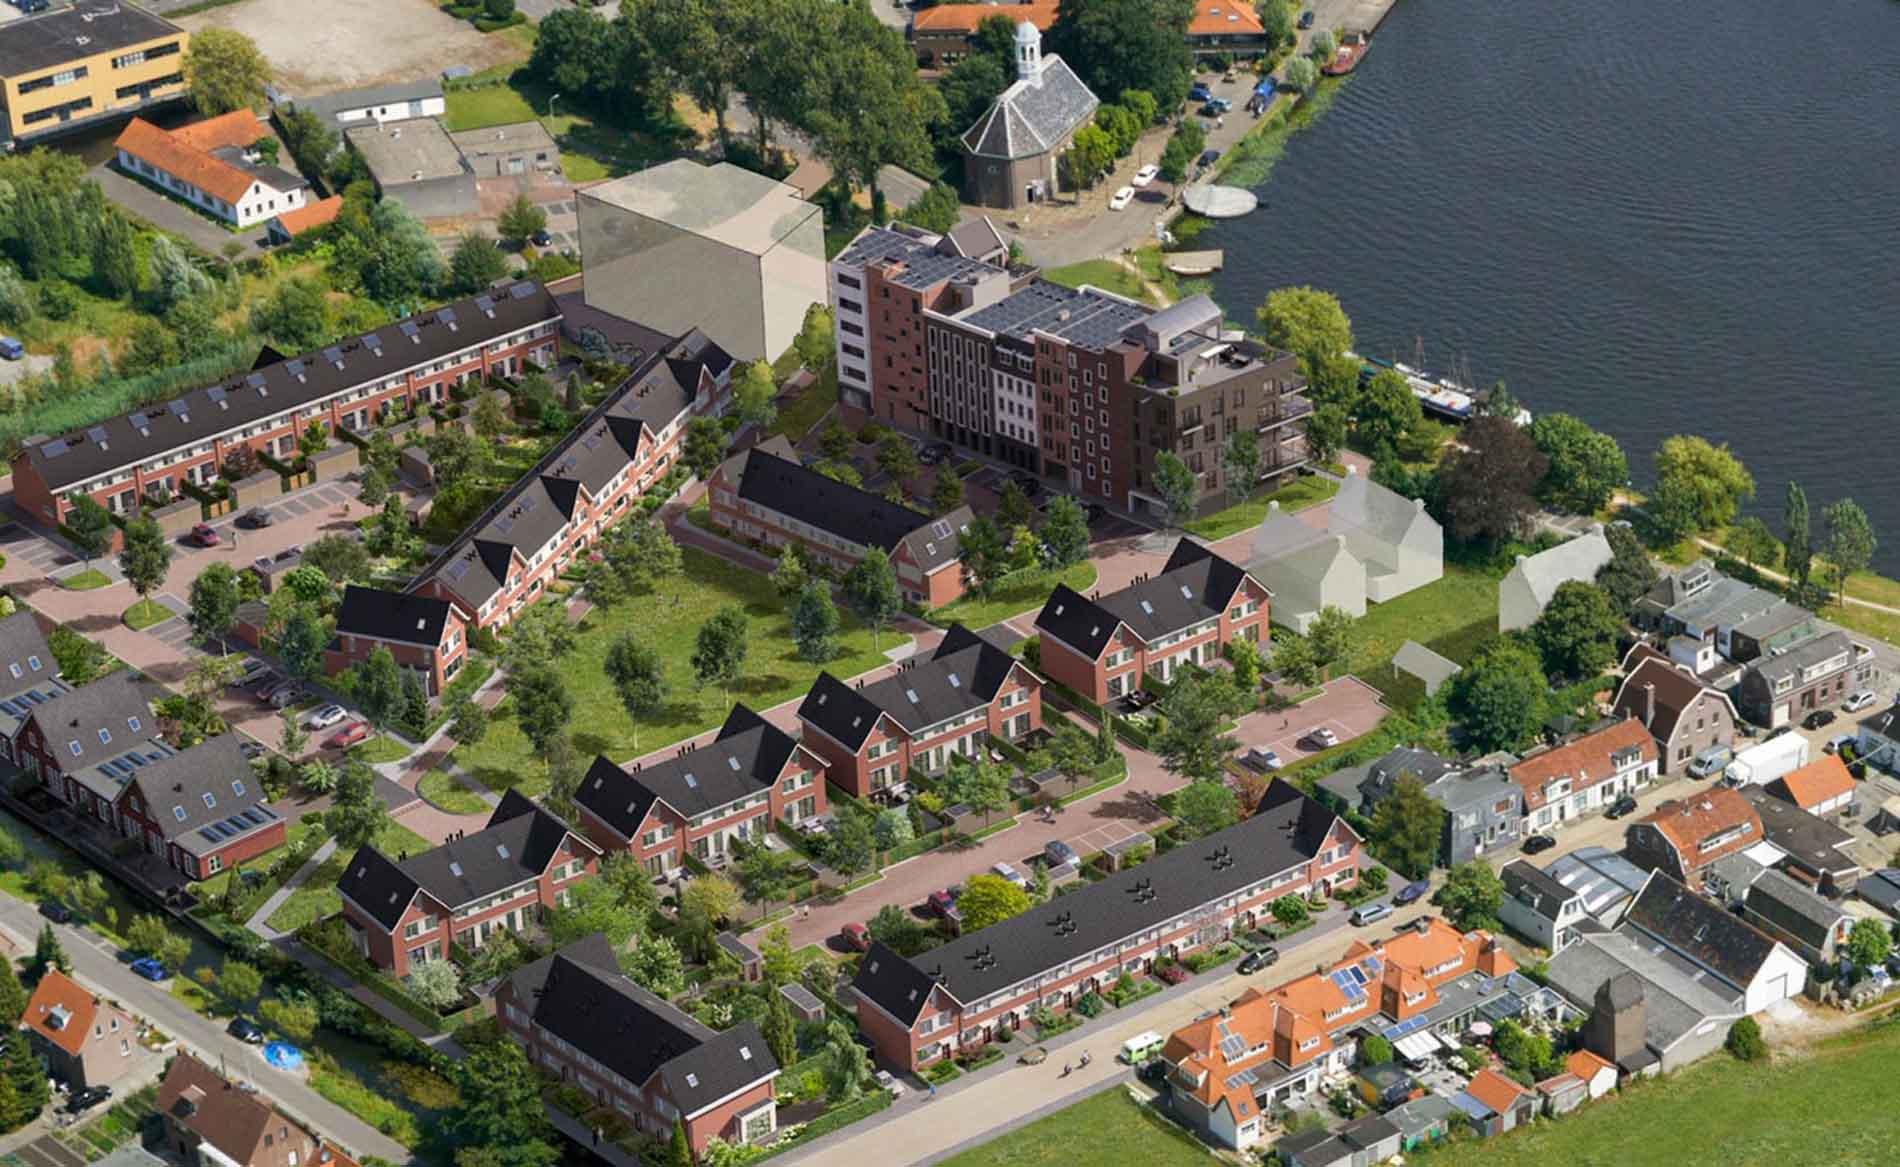 appartementen architect woningbouw Amstel Regentes Uithoorn BBHD architecten